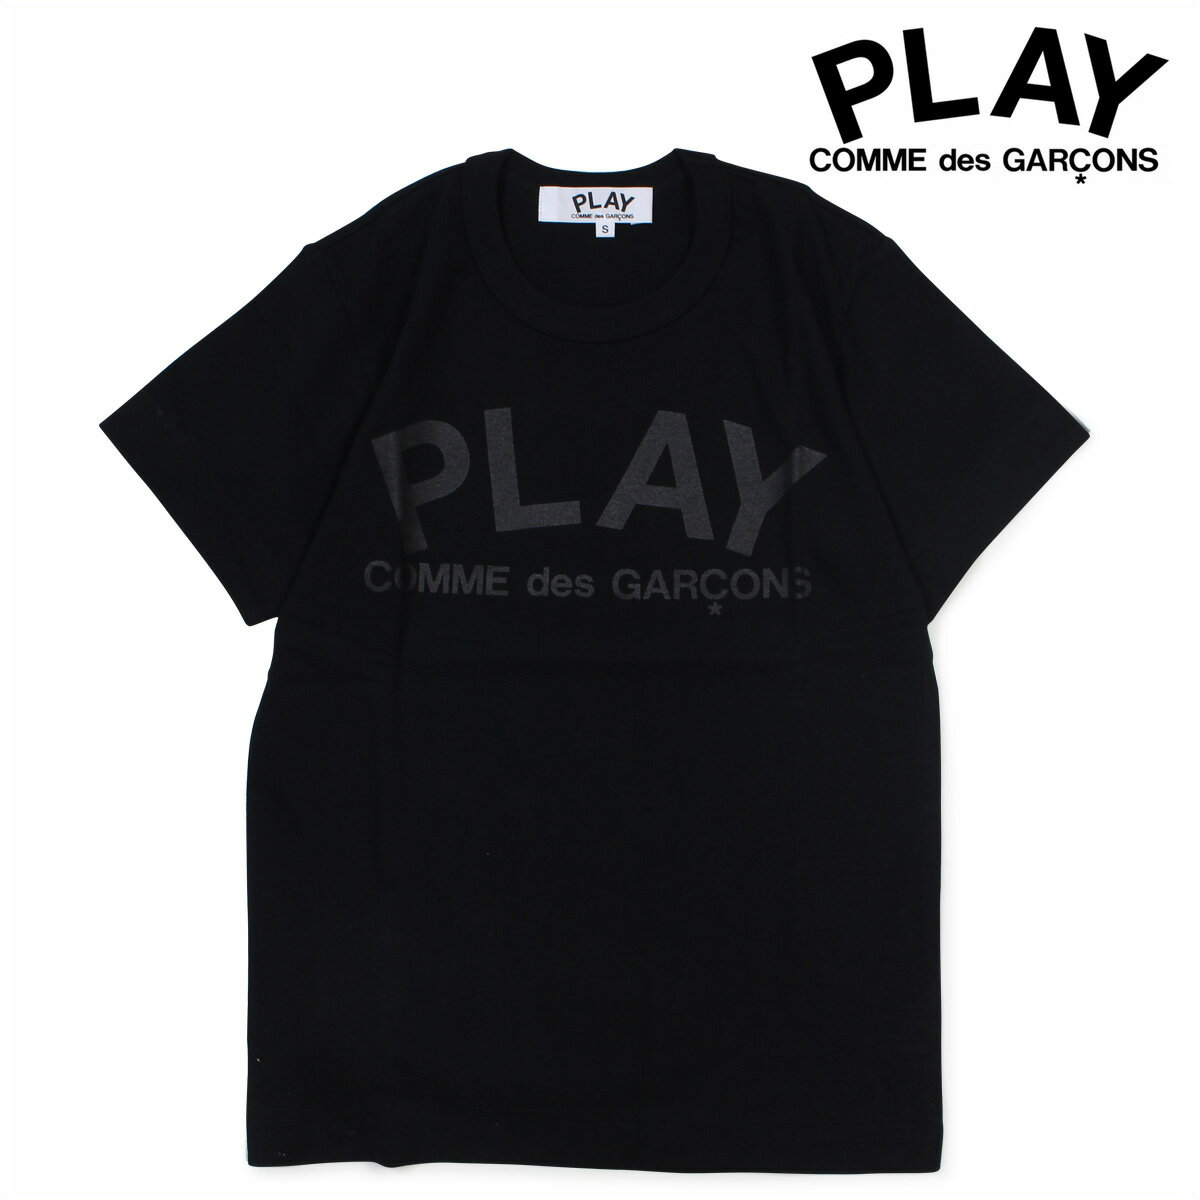 COMME des GARCONS PLAY PLAY T-SHIRT Tシャツ 半袖 コムデギャルソン レディース AZ-T187 ブラック